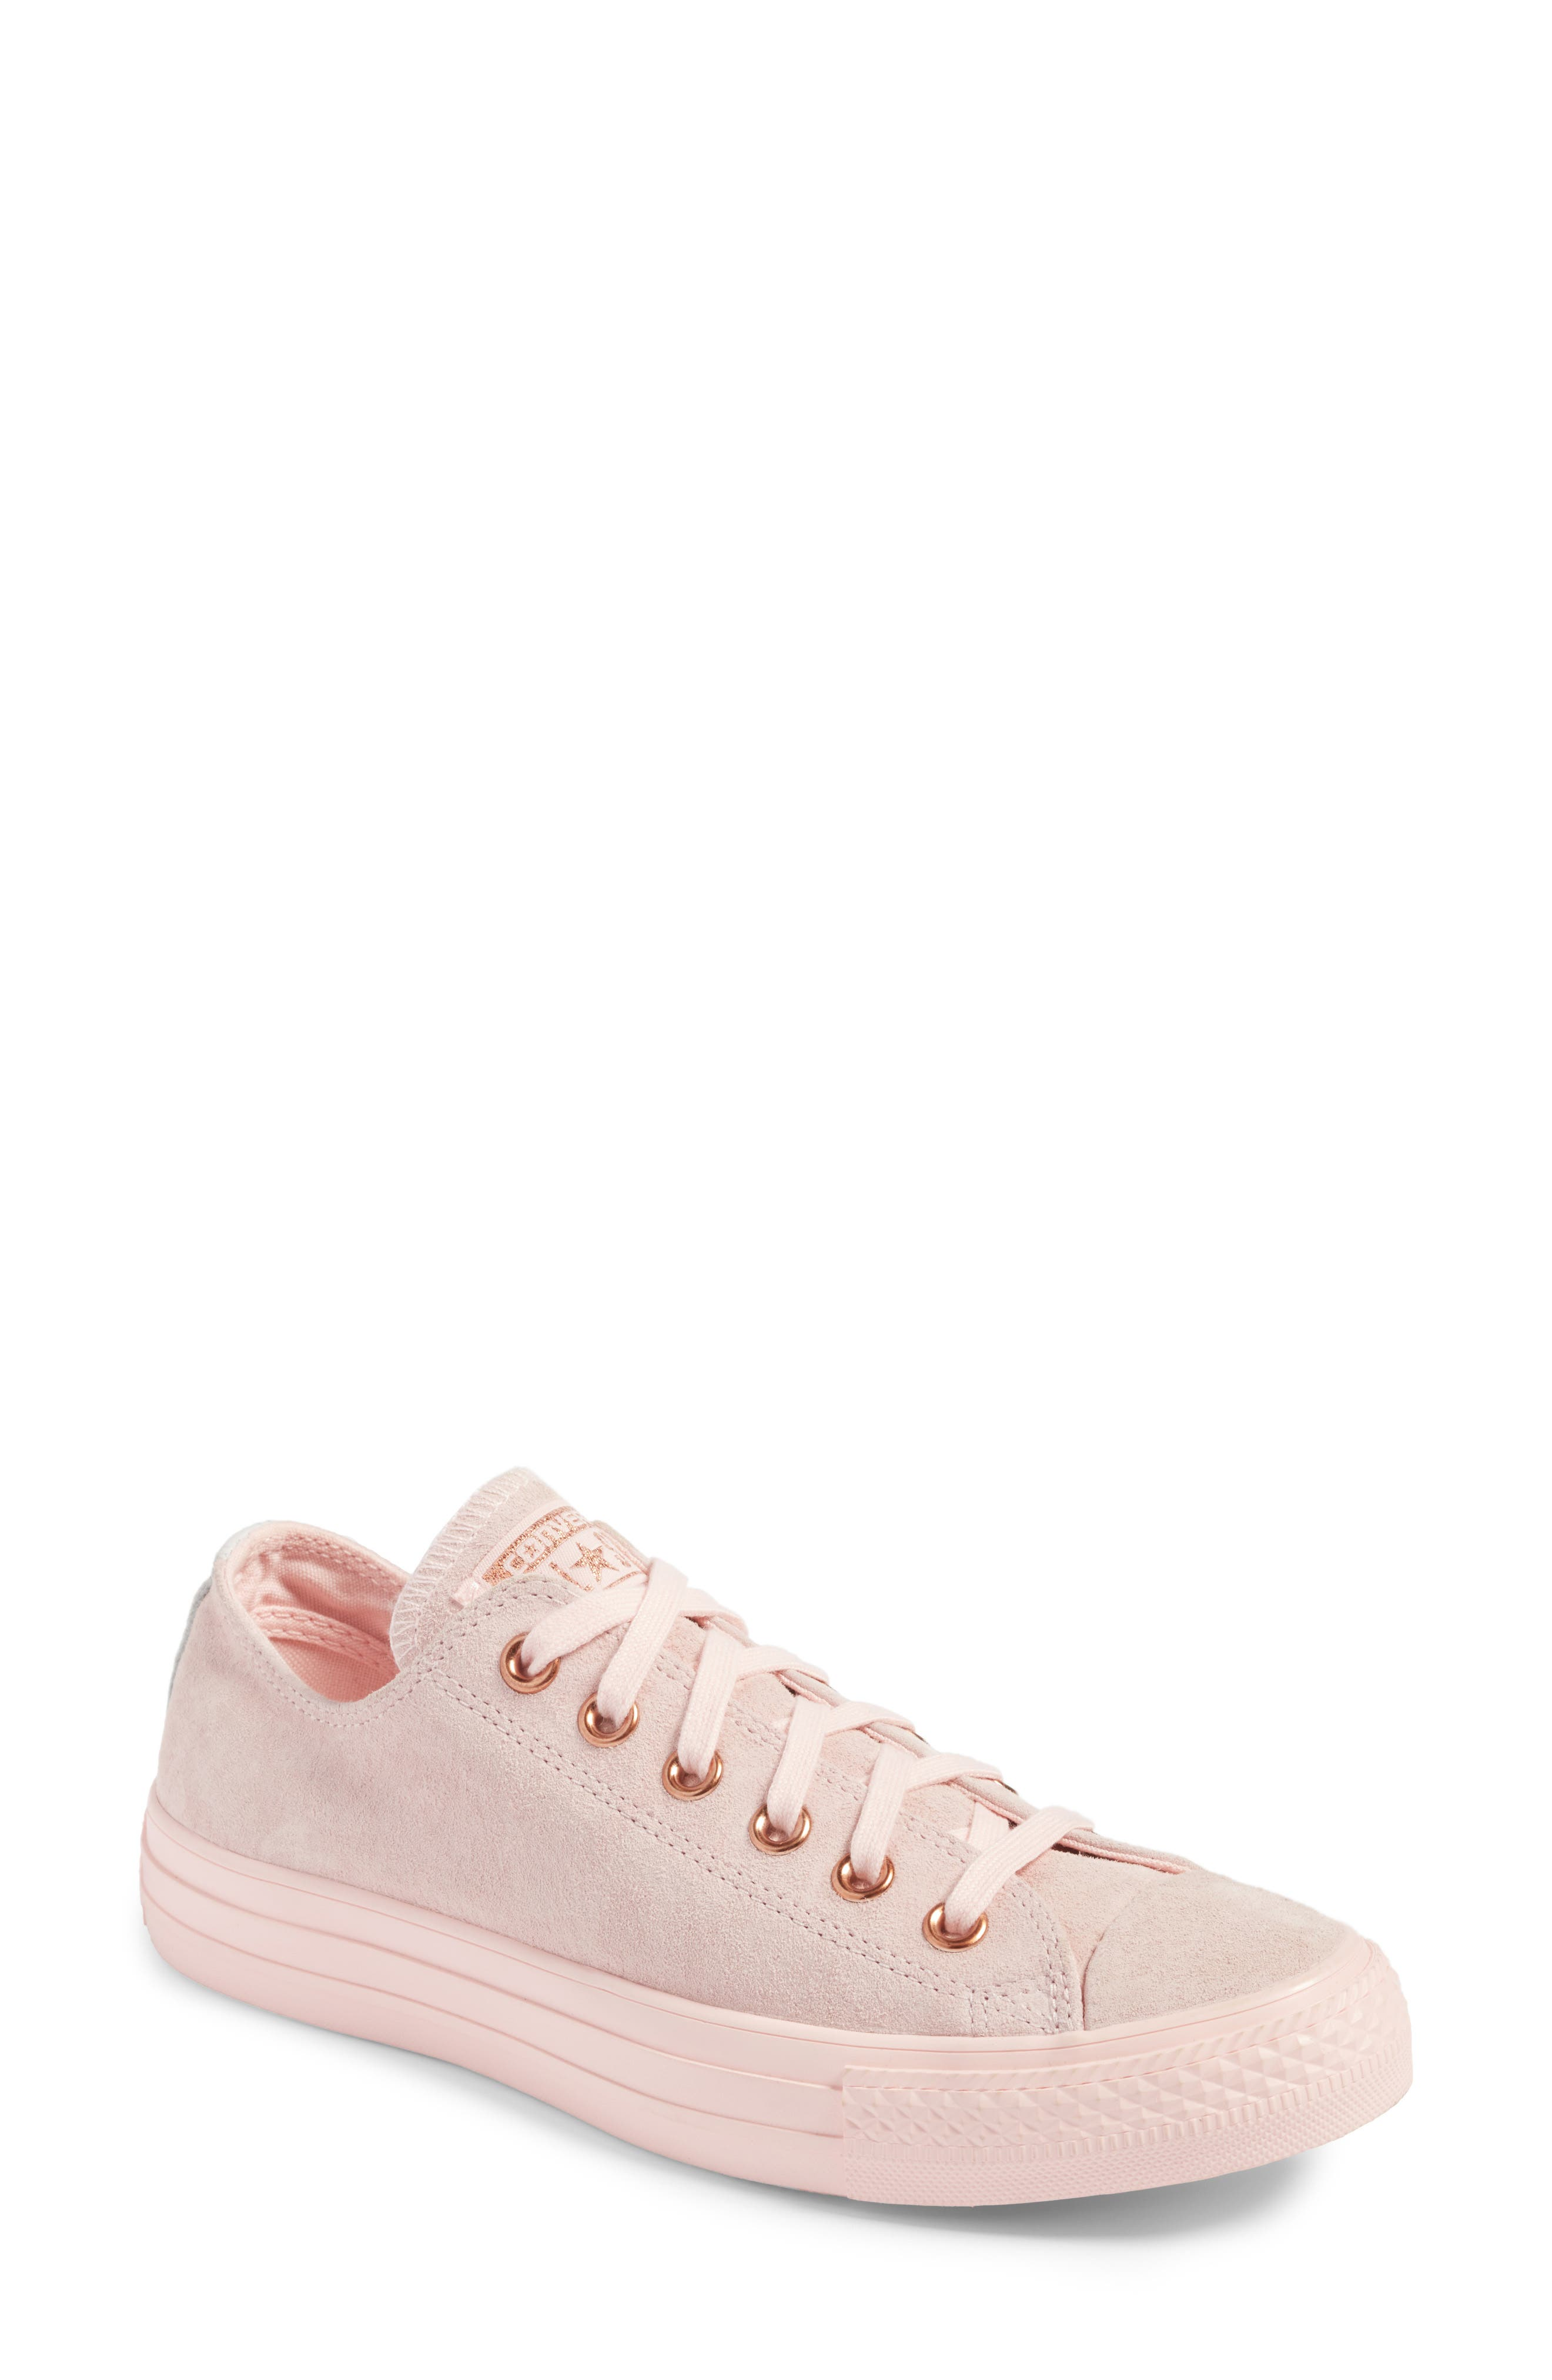 Blossom Sneaker,                         Main,                         color, Vapor Pink